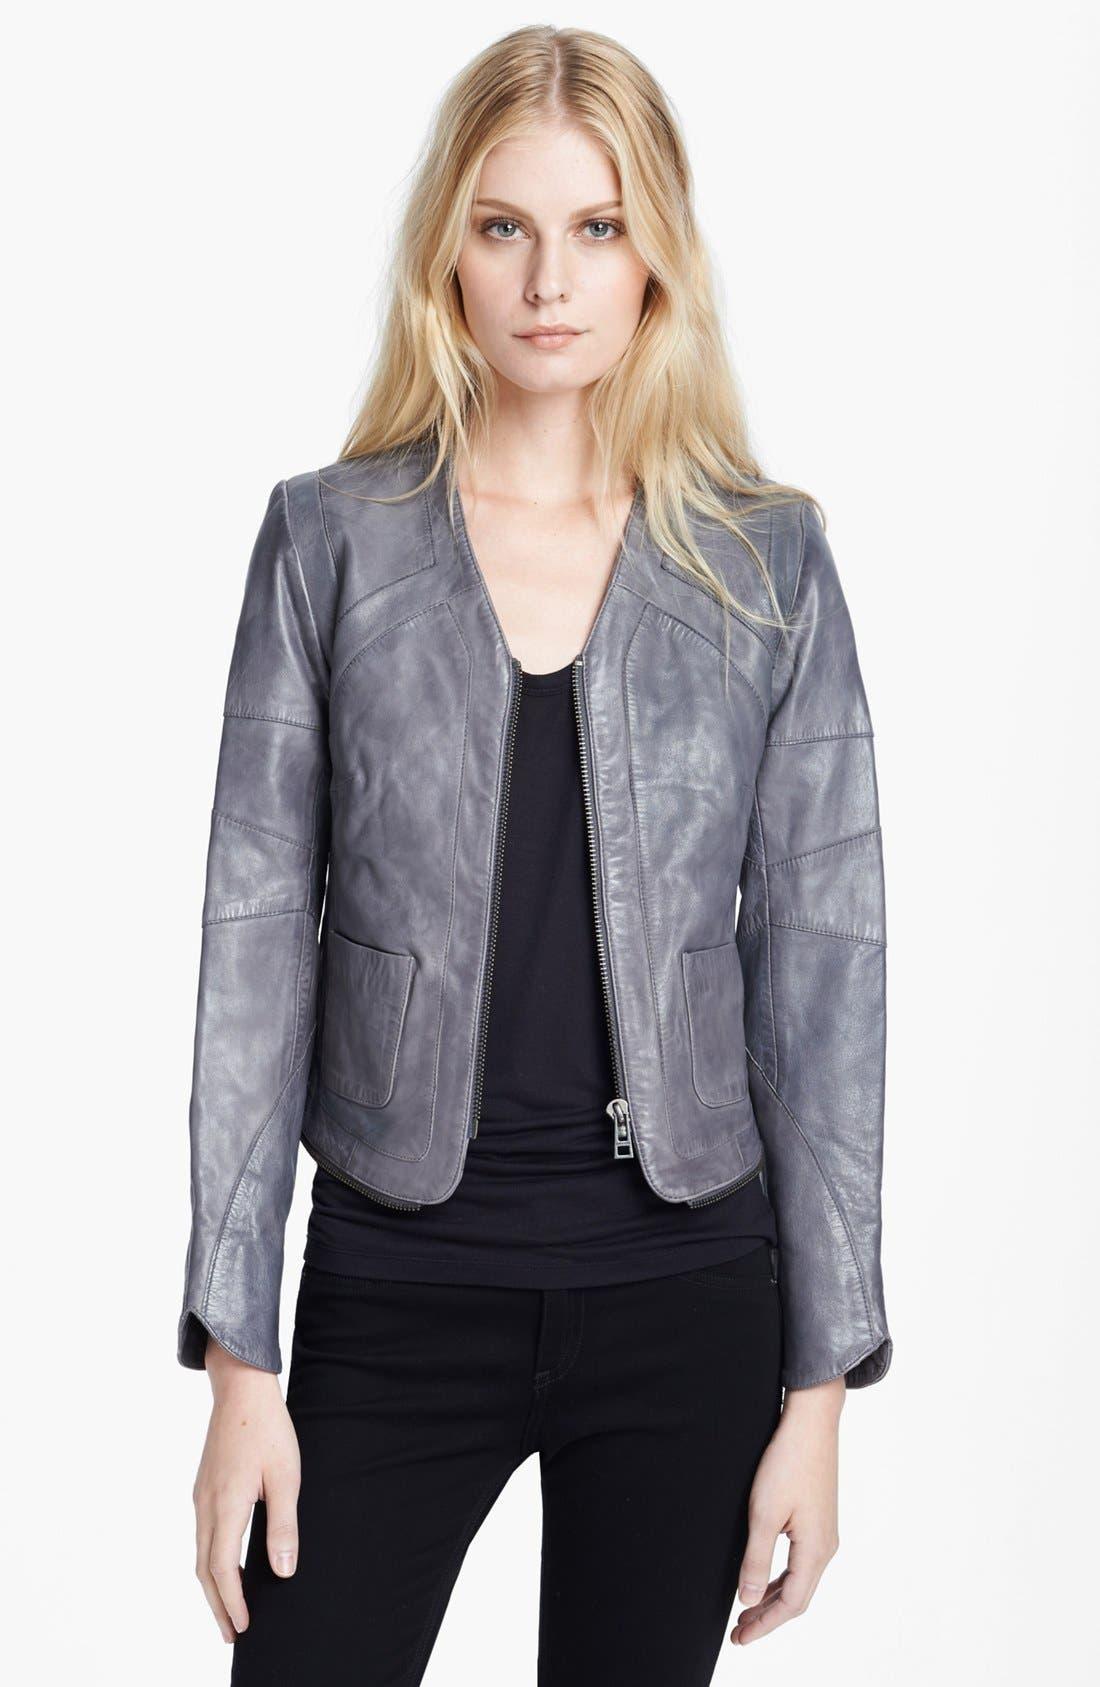 Alternate Image 1 Selected - Zadig & Voltaire 'Venci' Crop Leather Jacket